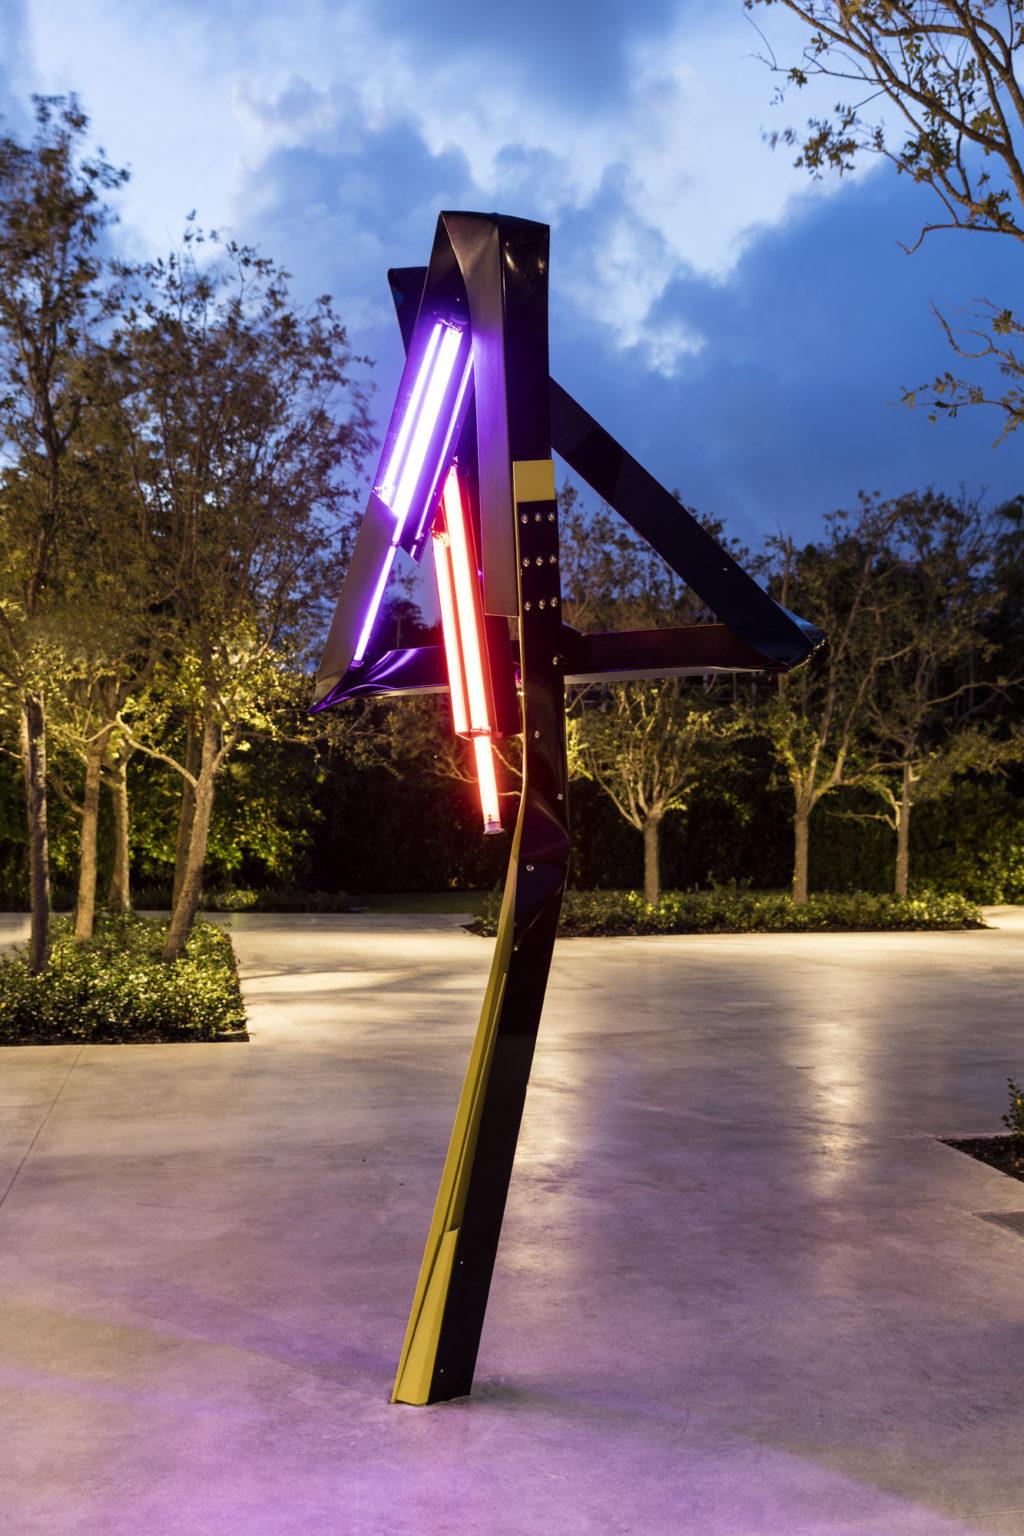 Installation view Mark Handforth, Dr Pepper, 2017 at ICA Miami